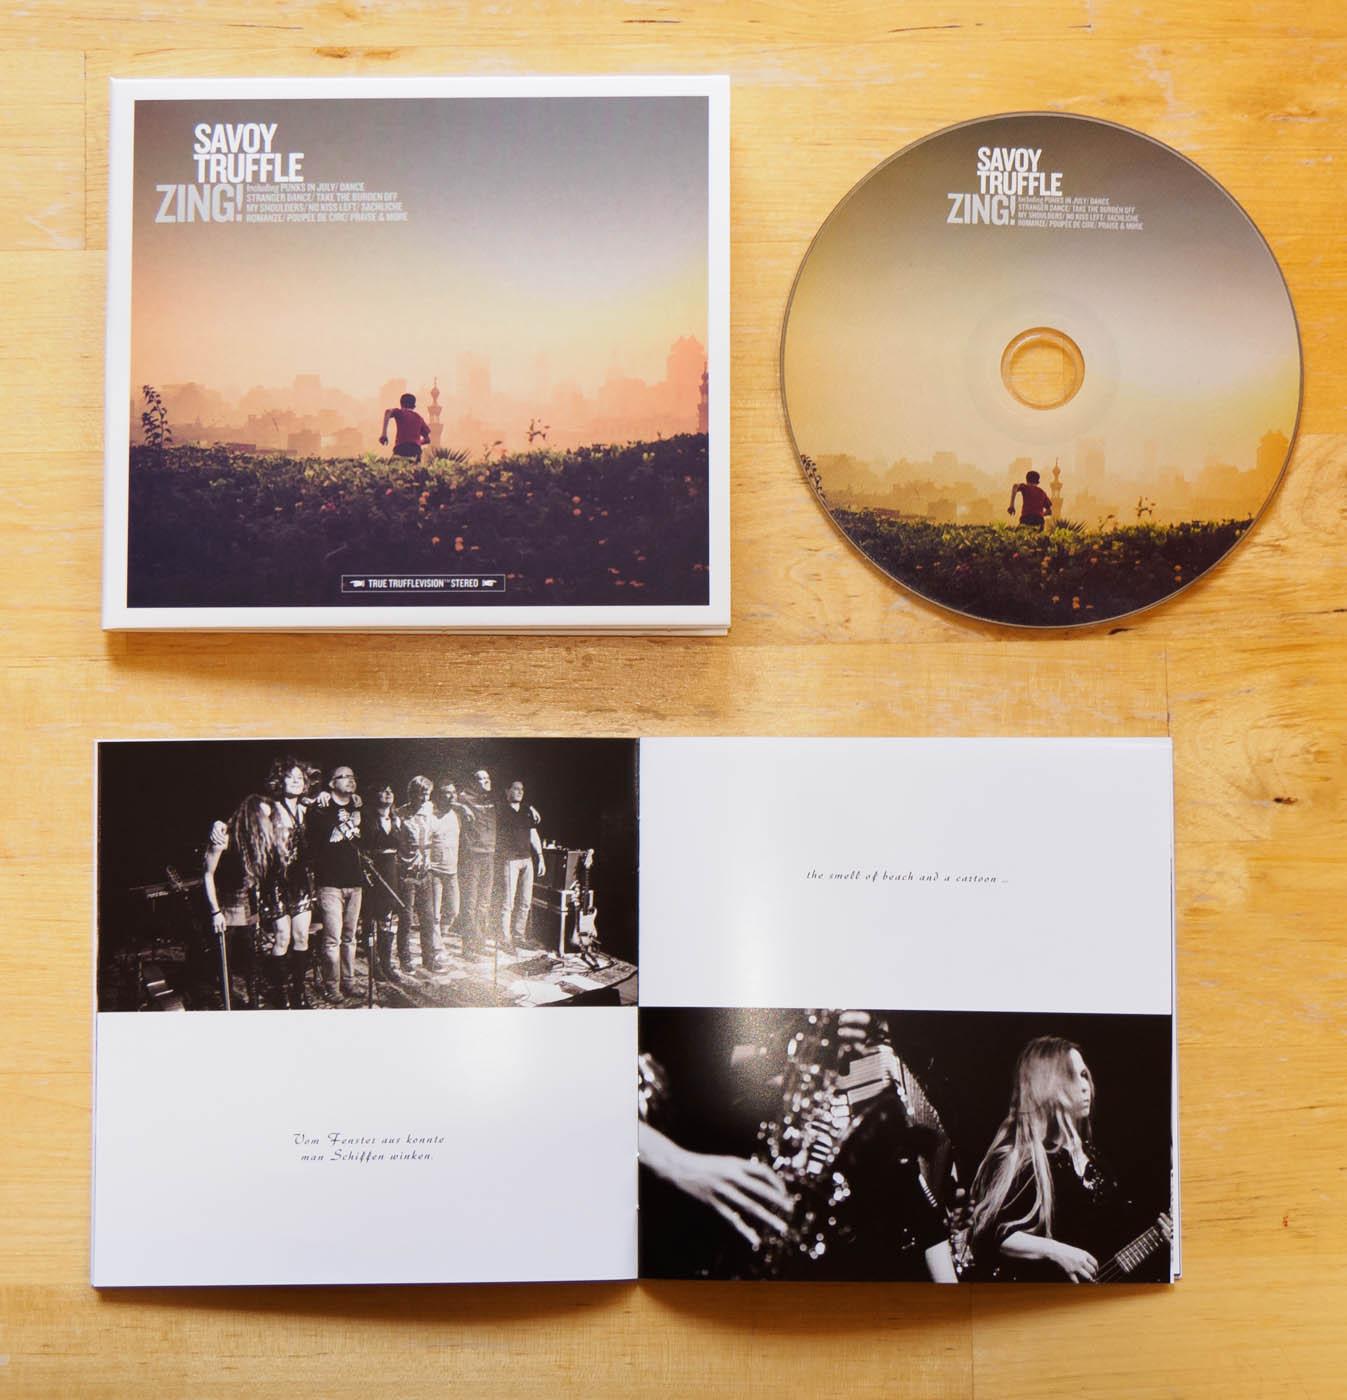 Savoy Truffle – Zing! (Digisleeve, CD, Bookletseiten)